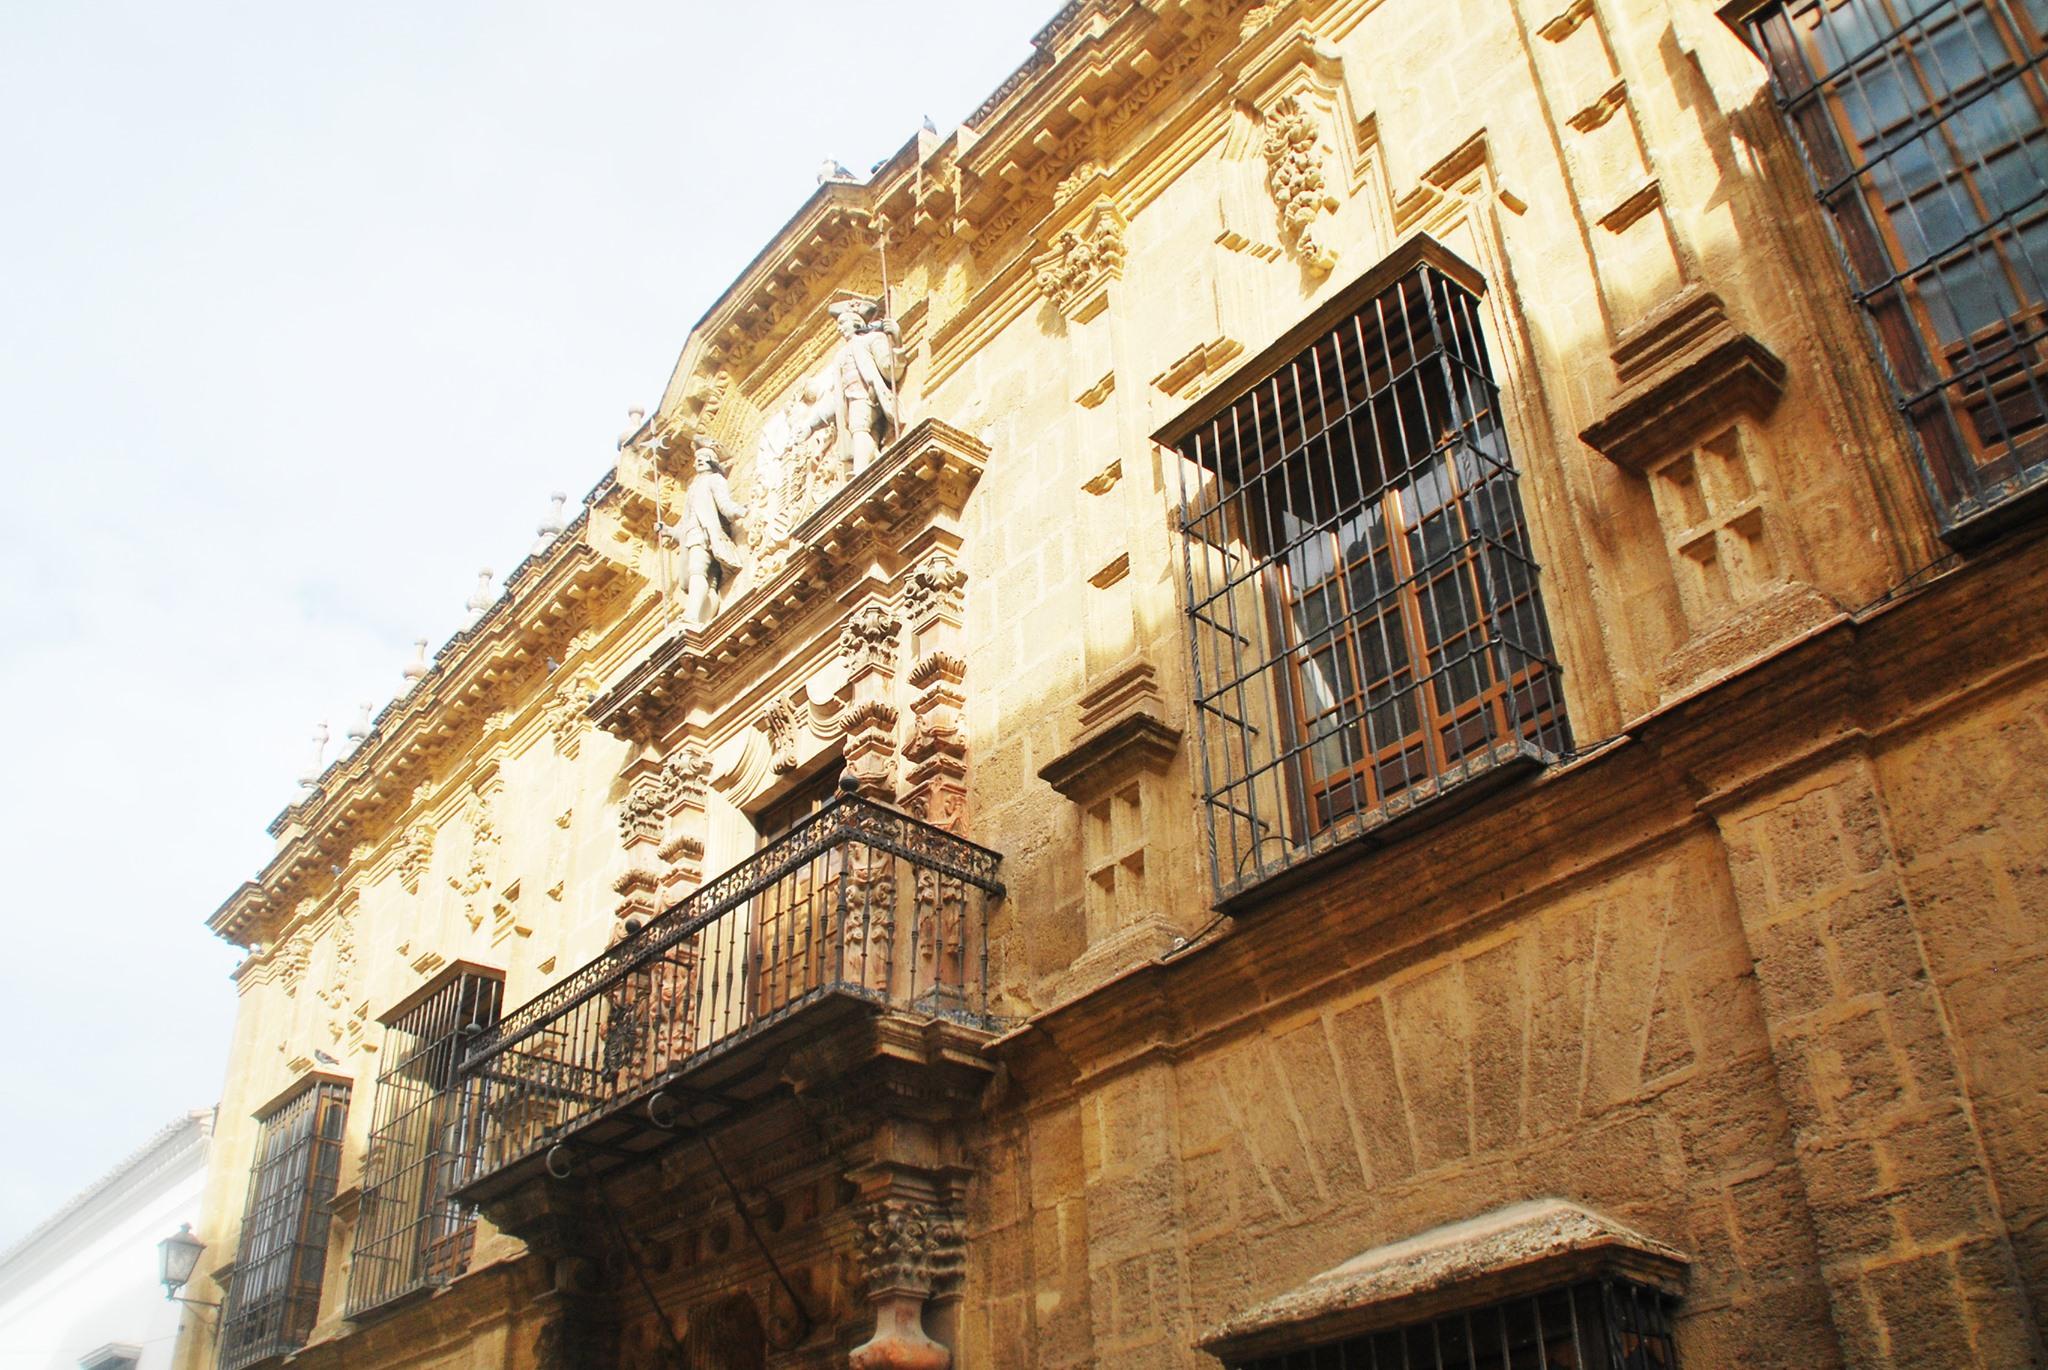 Palacio Cepeda Osuna